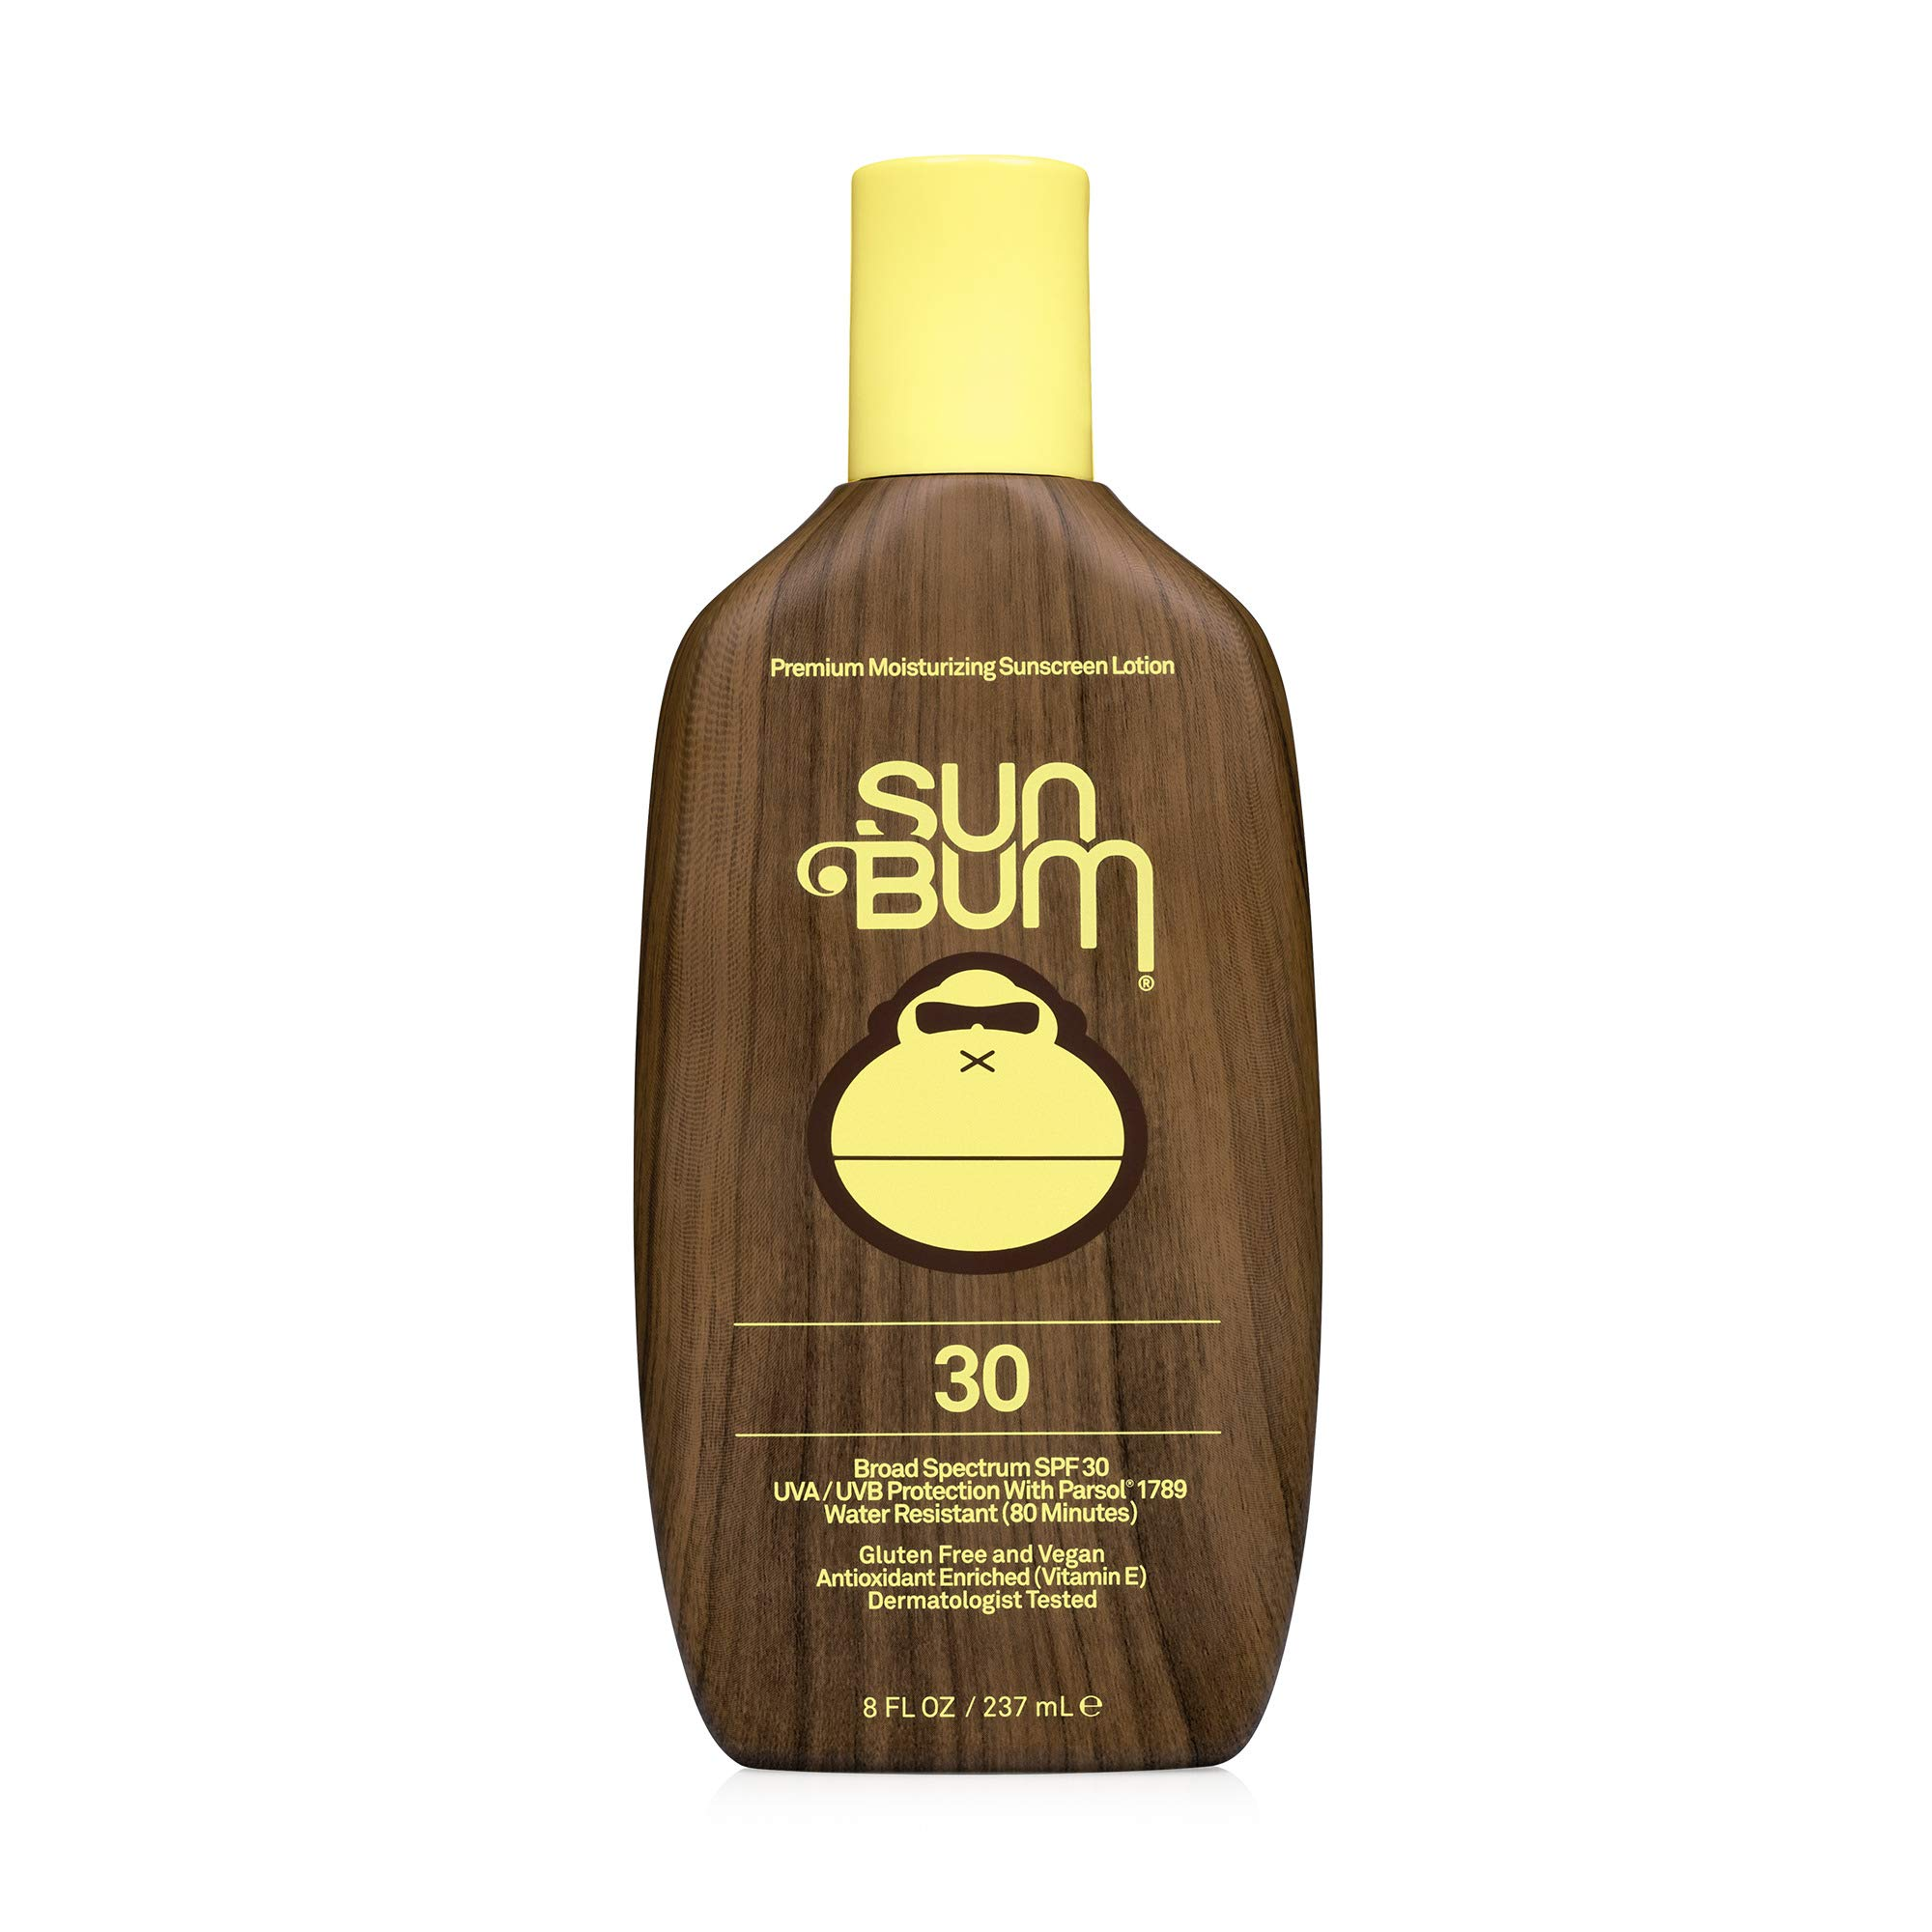 Sun Bum Original SPF 30 Sunscreen Lotion | Vegan and Reef Friendly (Octinoxate & Oxybenzone Free) Broad Spectrum Moisturizing UVA/UVB Sunscreen with Vitamin E | 8 oz